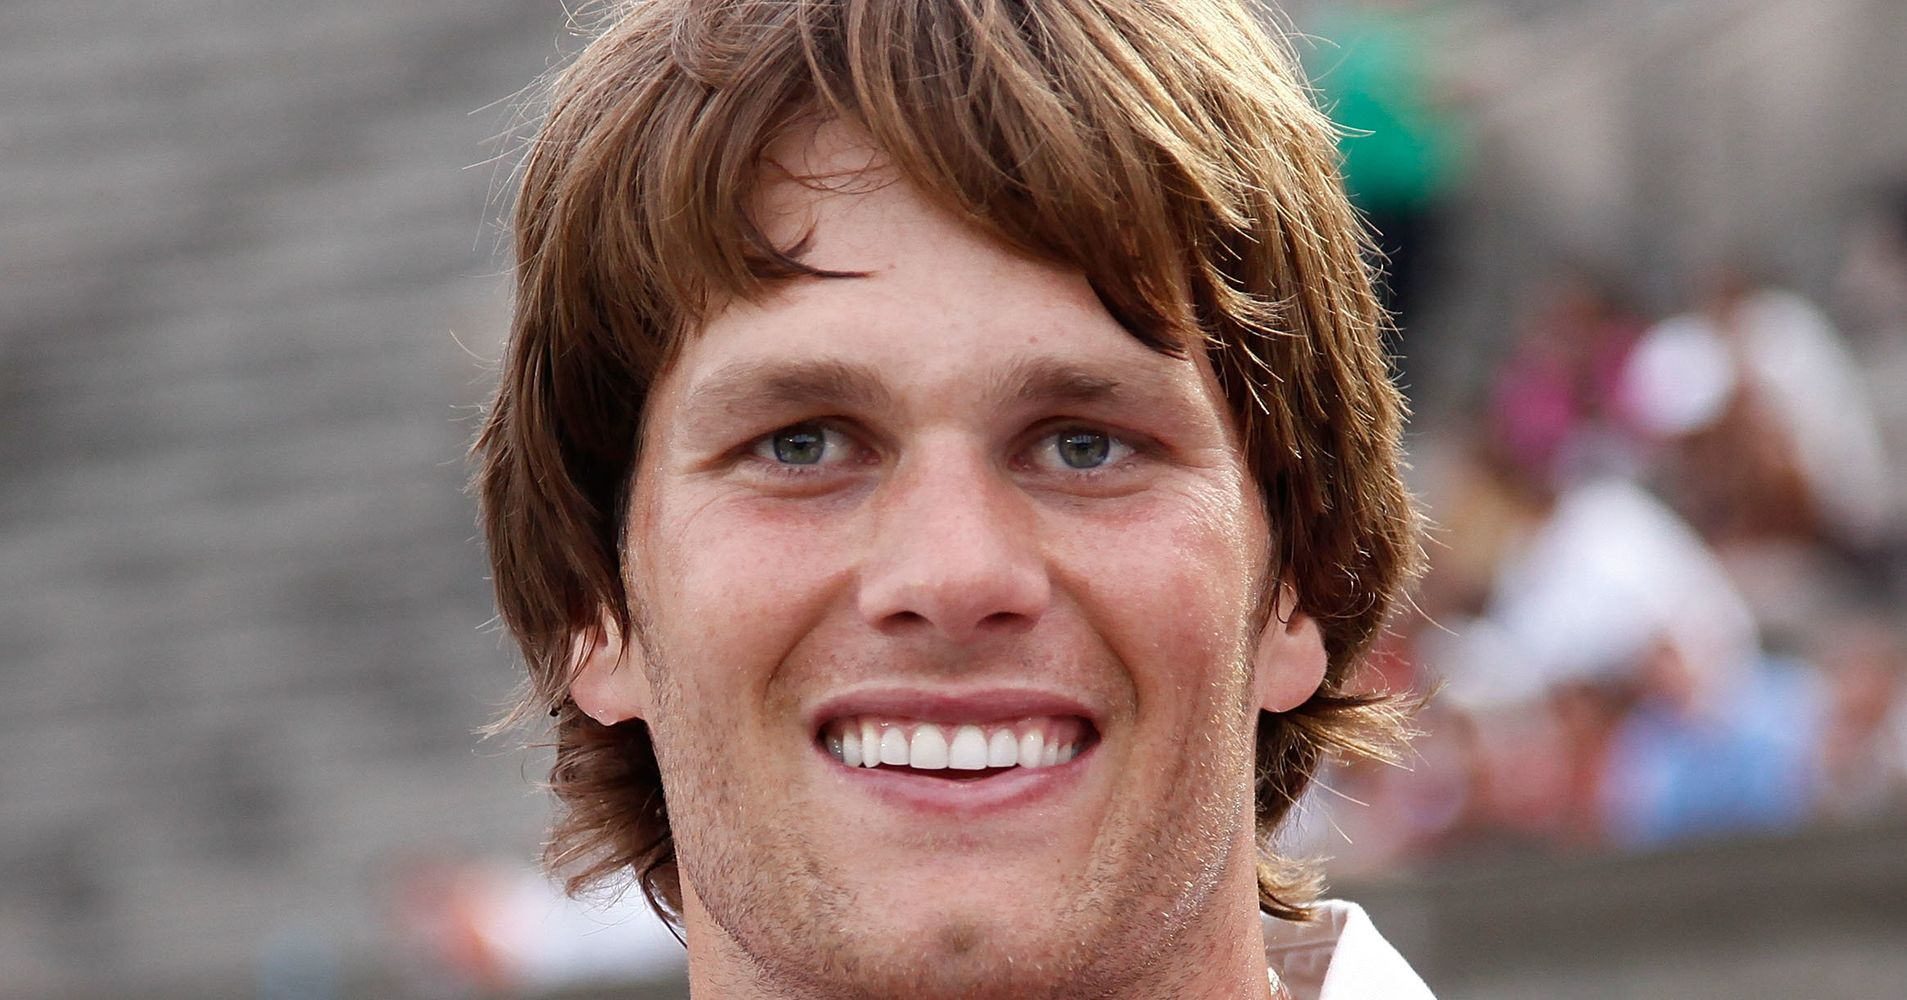 Tom Brady Has Had Way More Hairstyles Than Super Bowl Wins